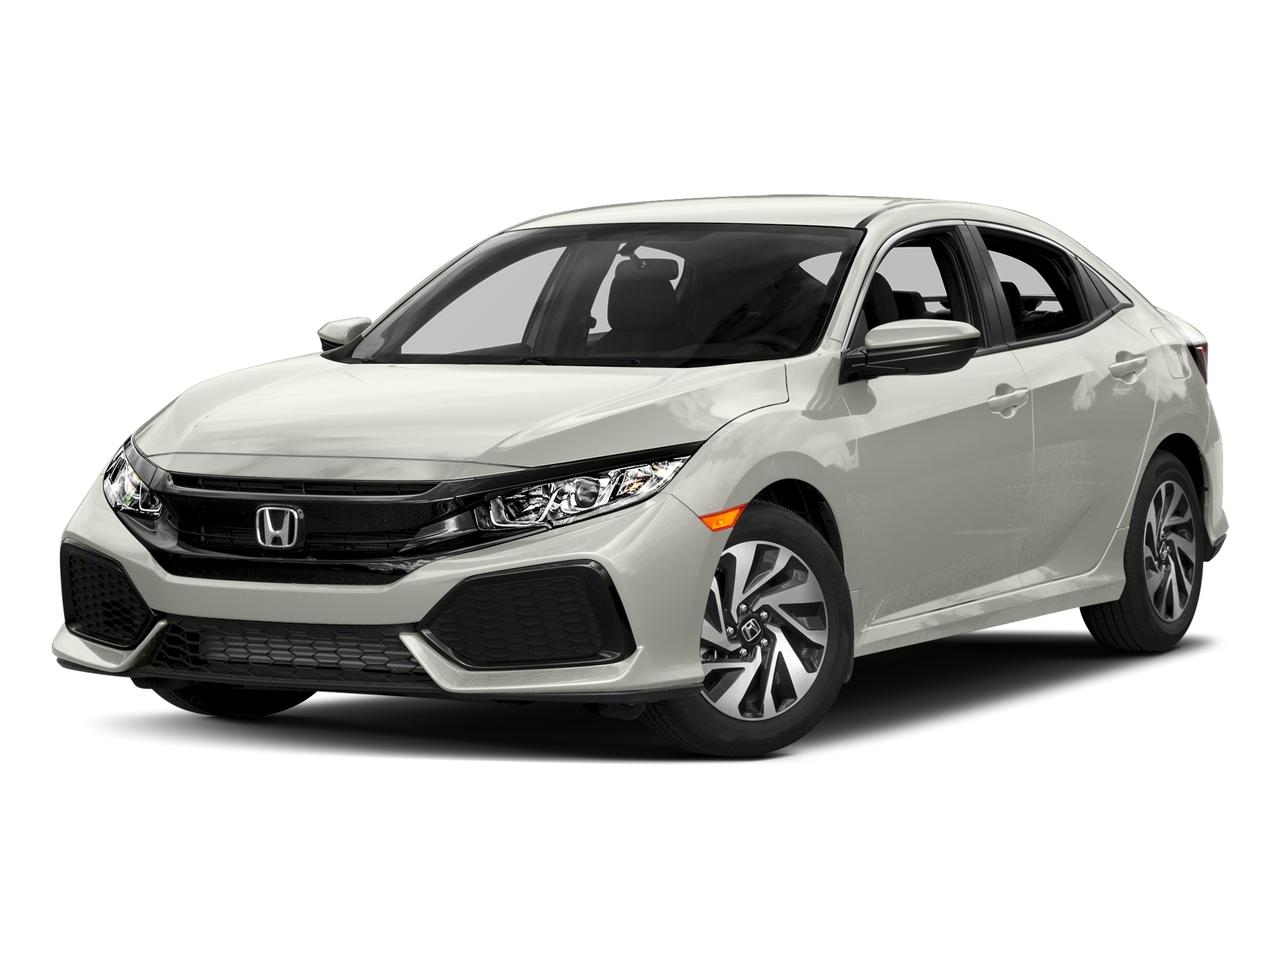 2017 Honda Civic Hatchback Vehicle Photo in San Antonio, TX 78238